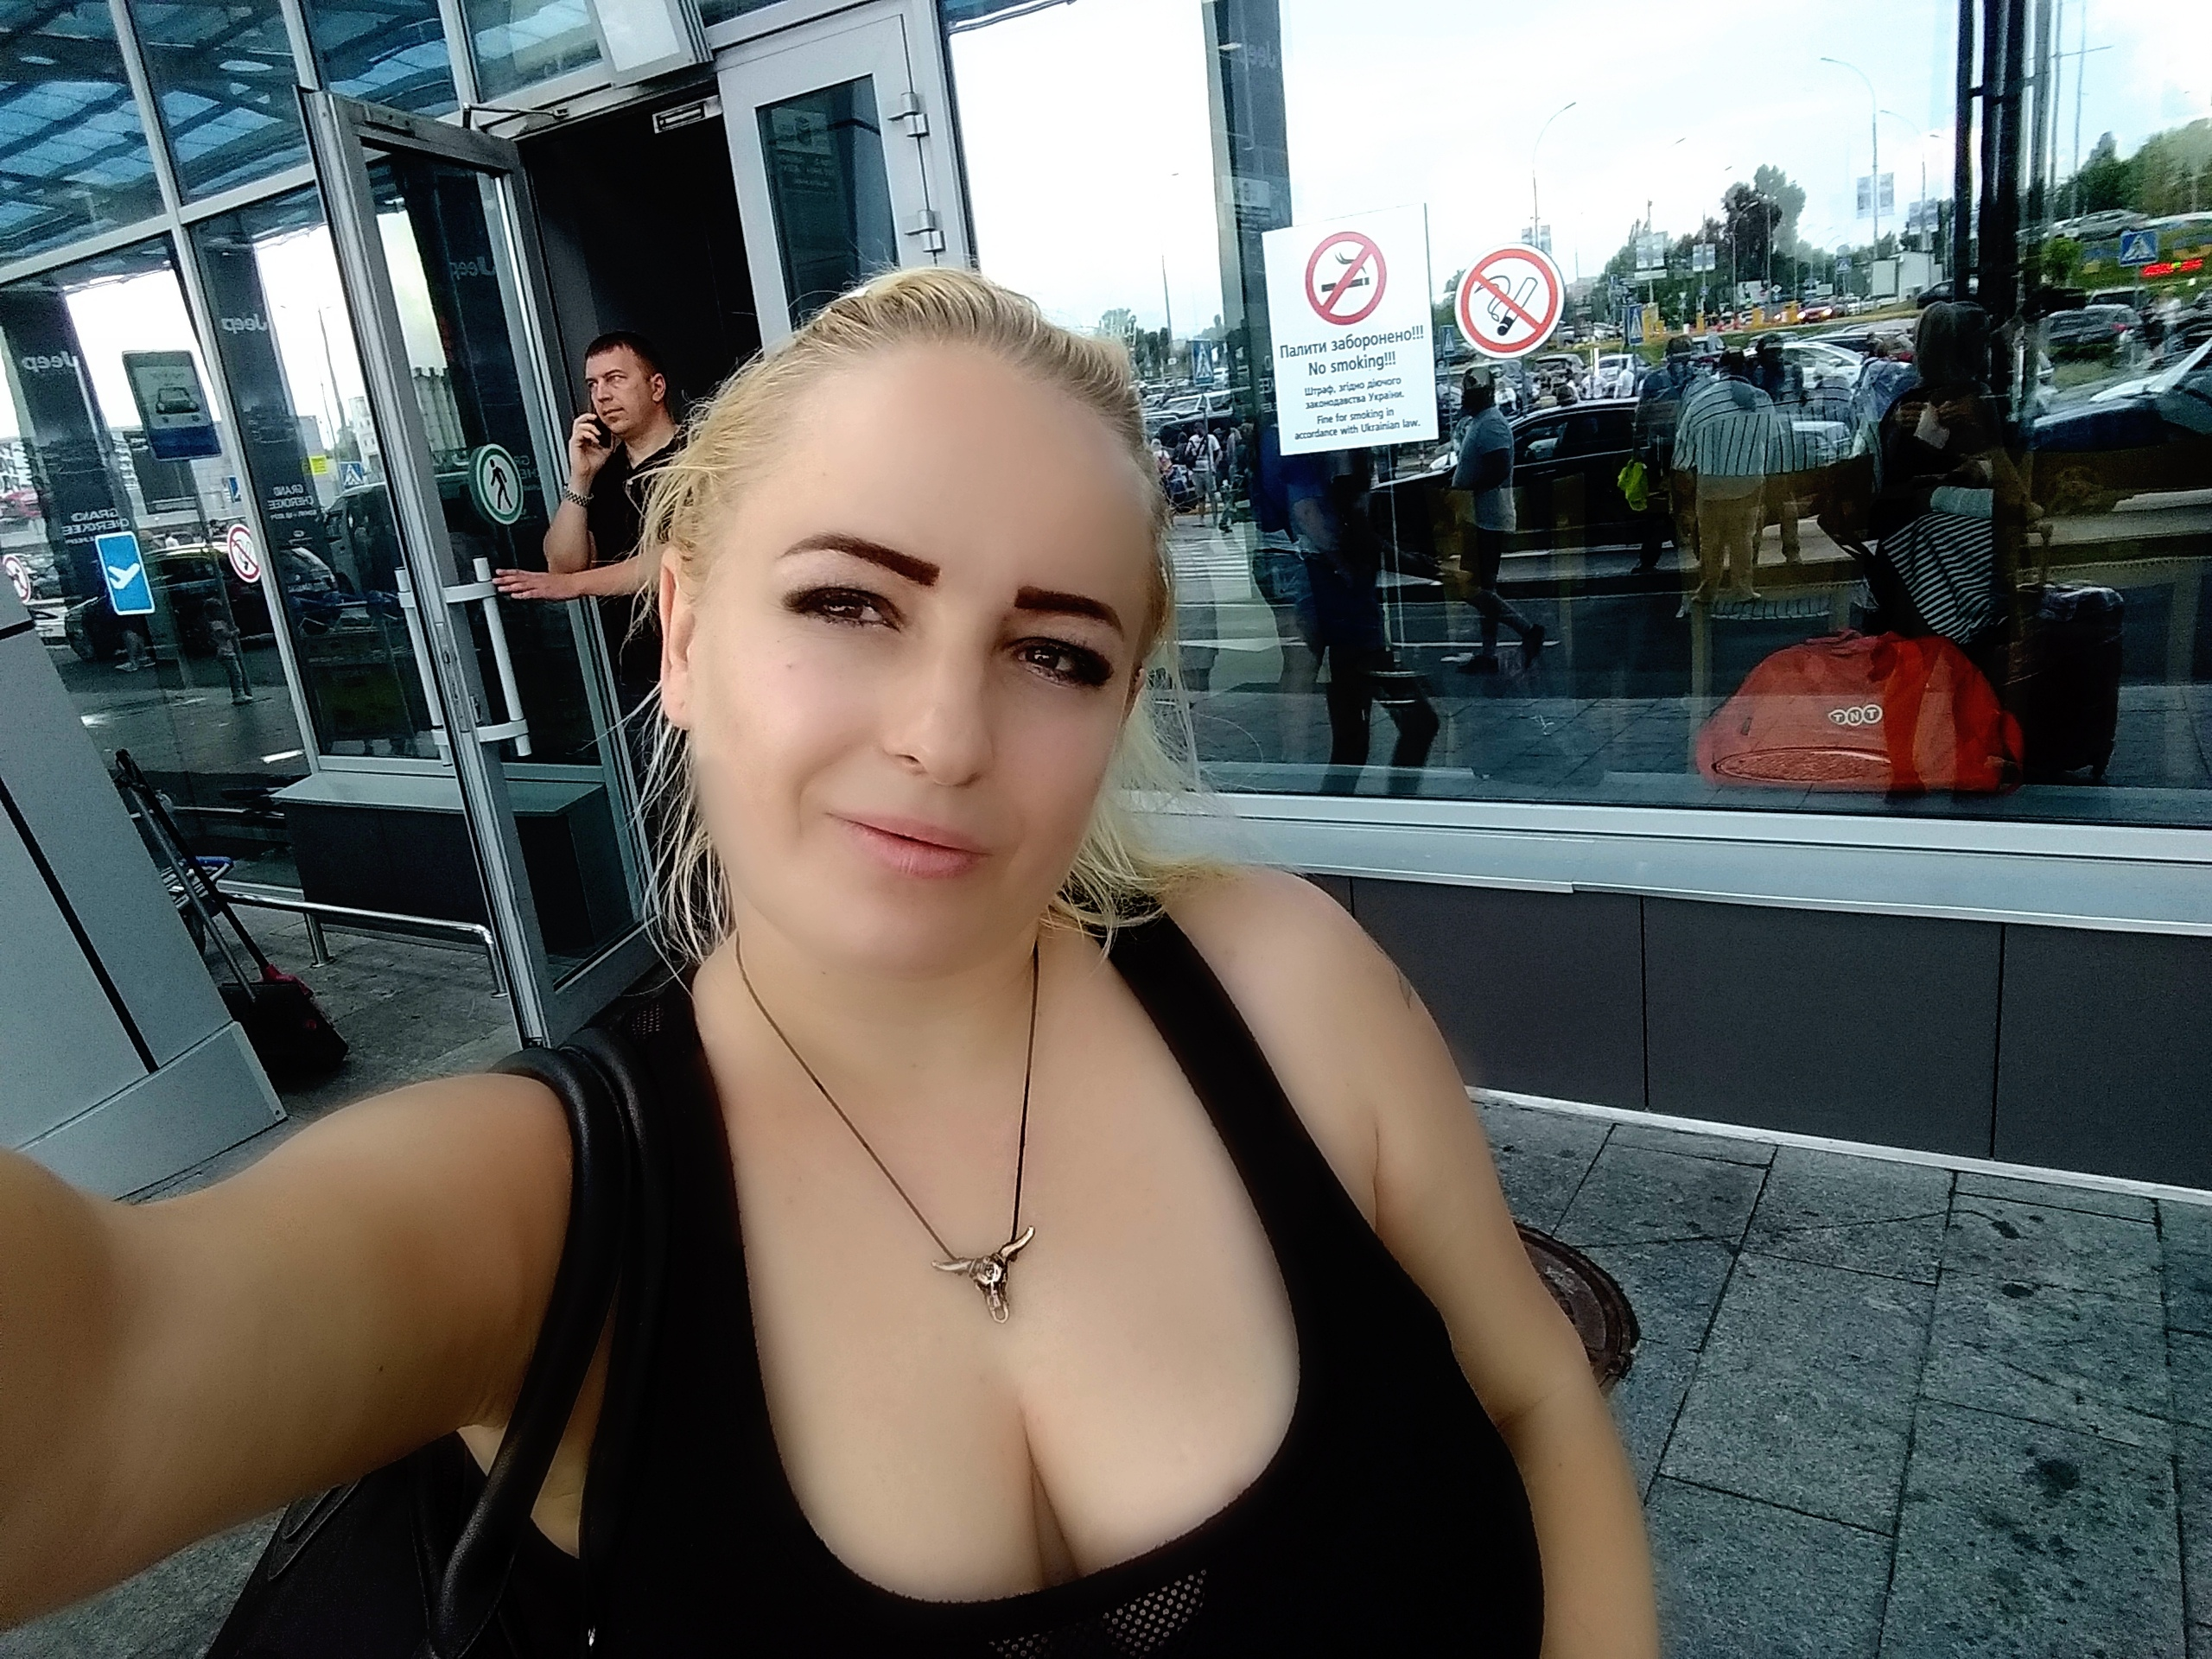 Елена Руденко (Валтея). Украина. Киев. Фото и описание.  NZquVdM7hmM